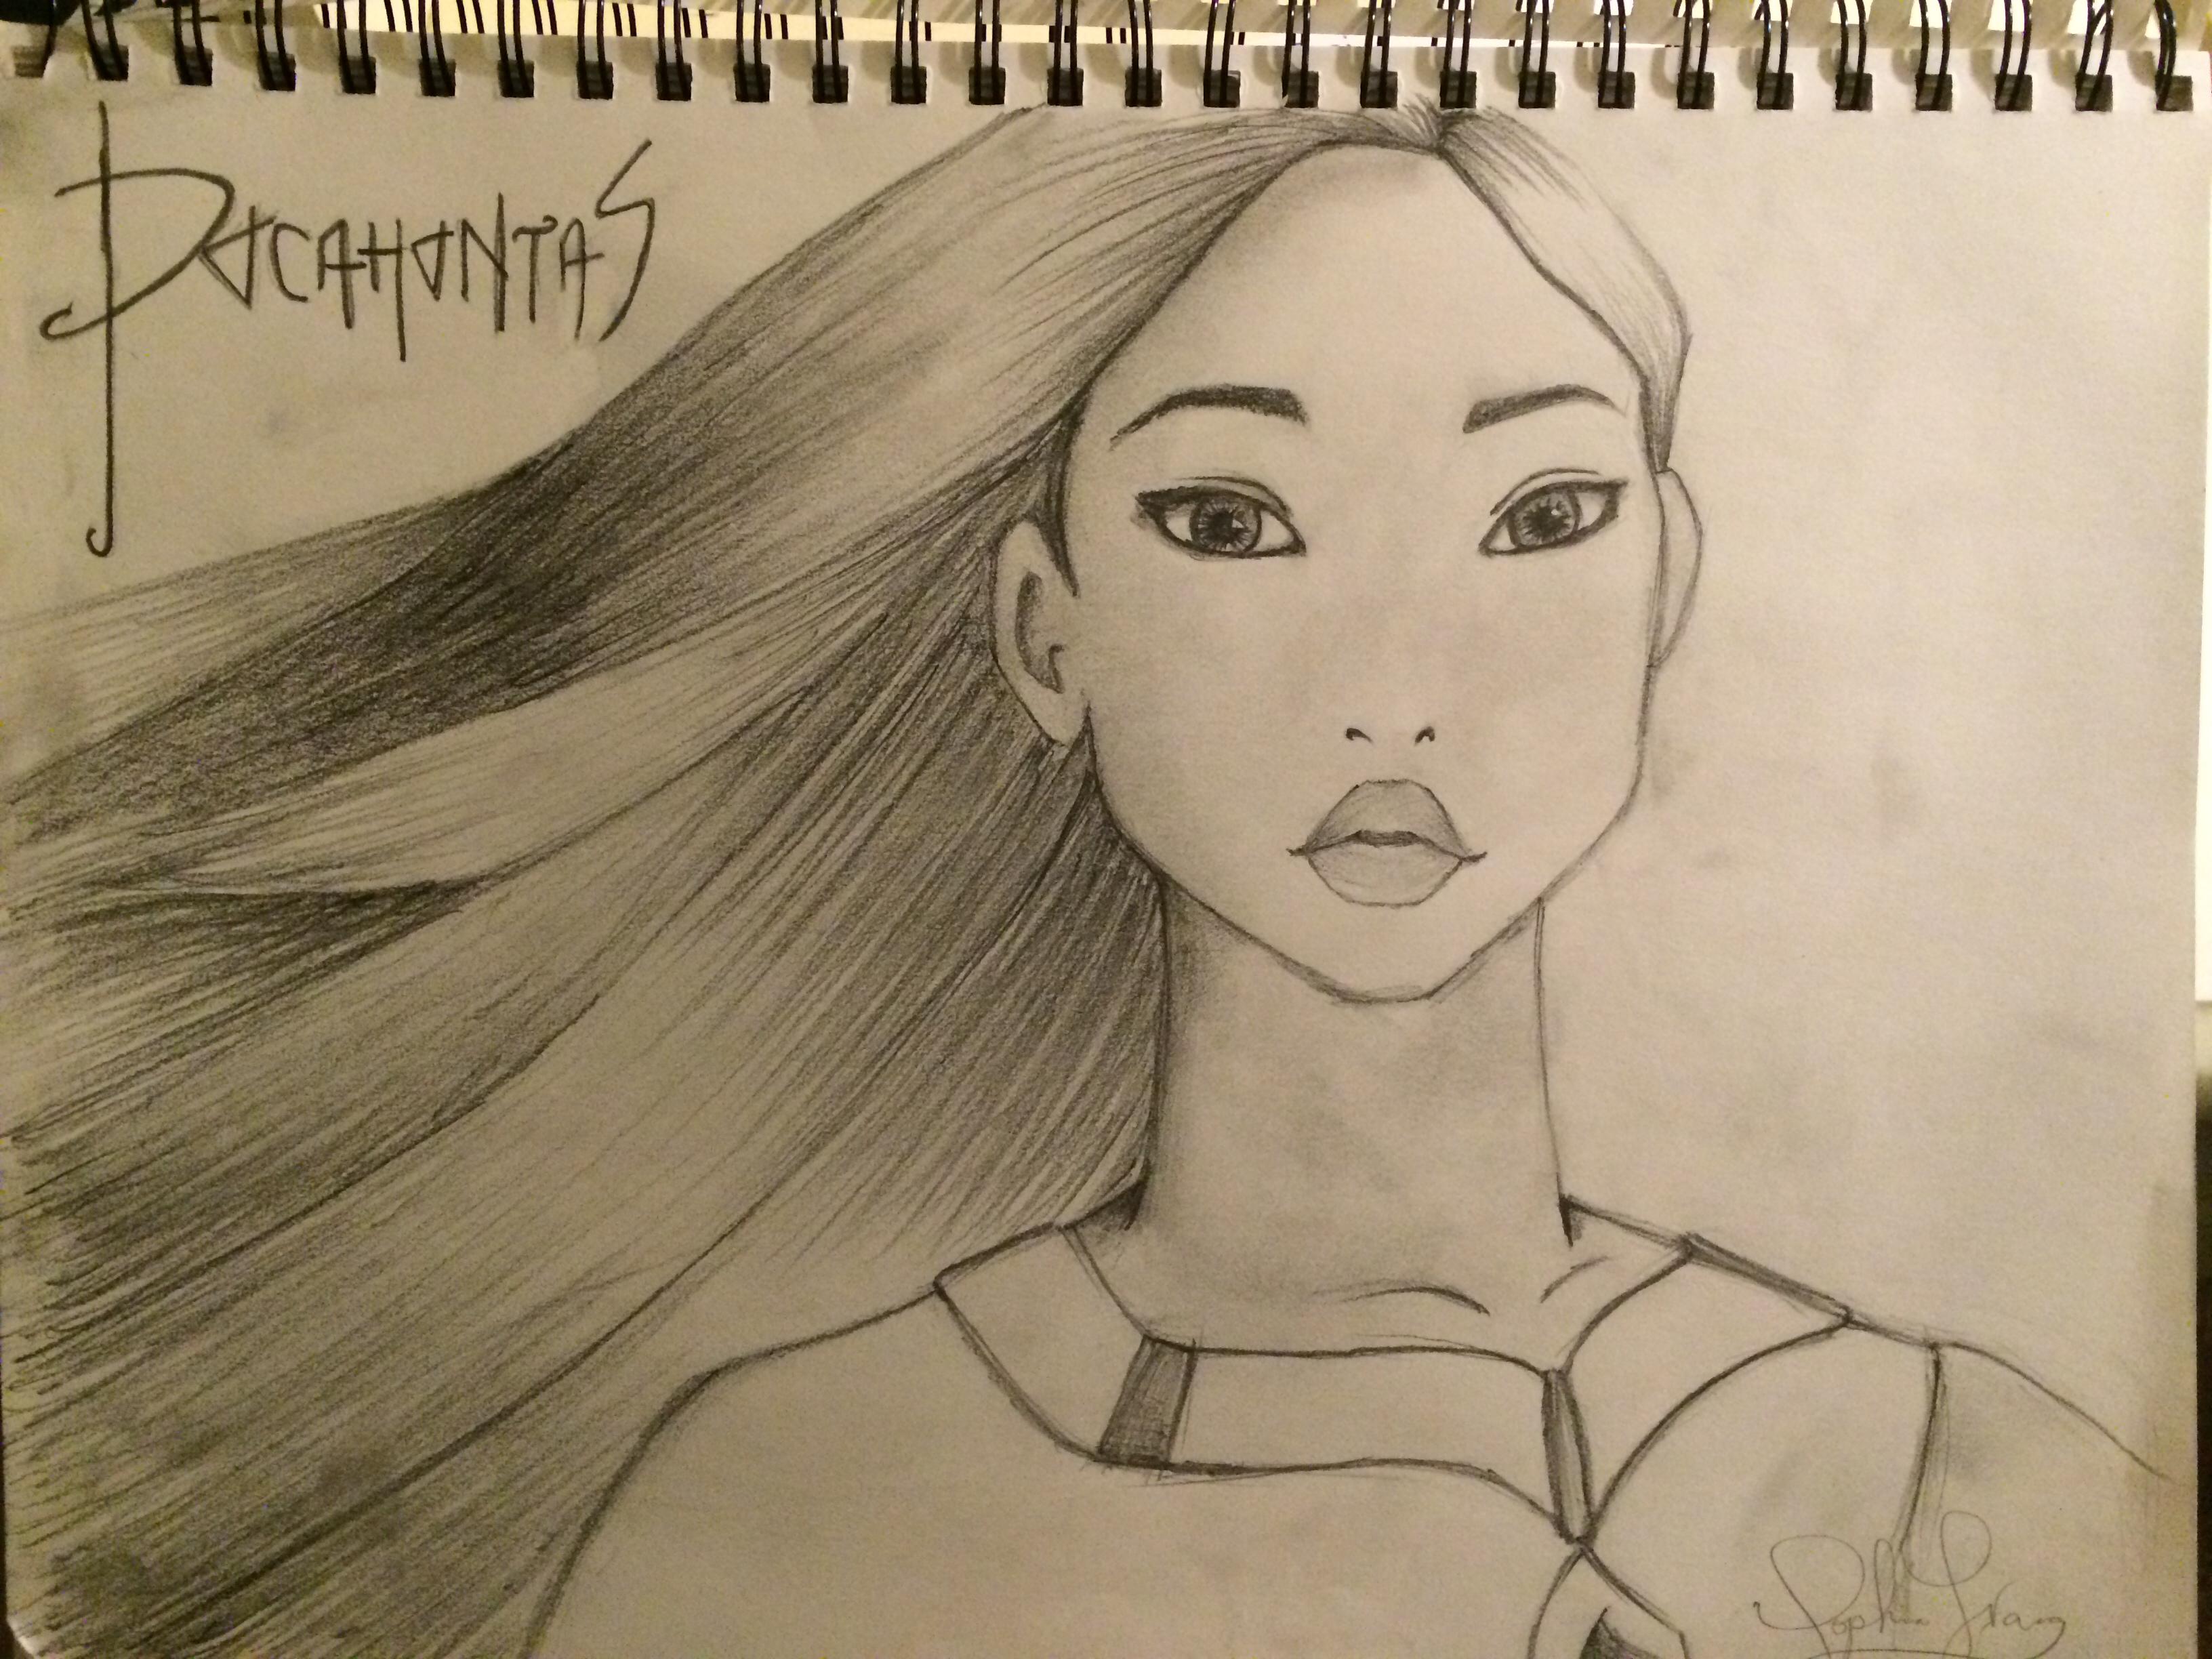 Drawn sanya pencil Pencil Artistic drawing  pencil